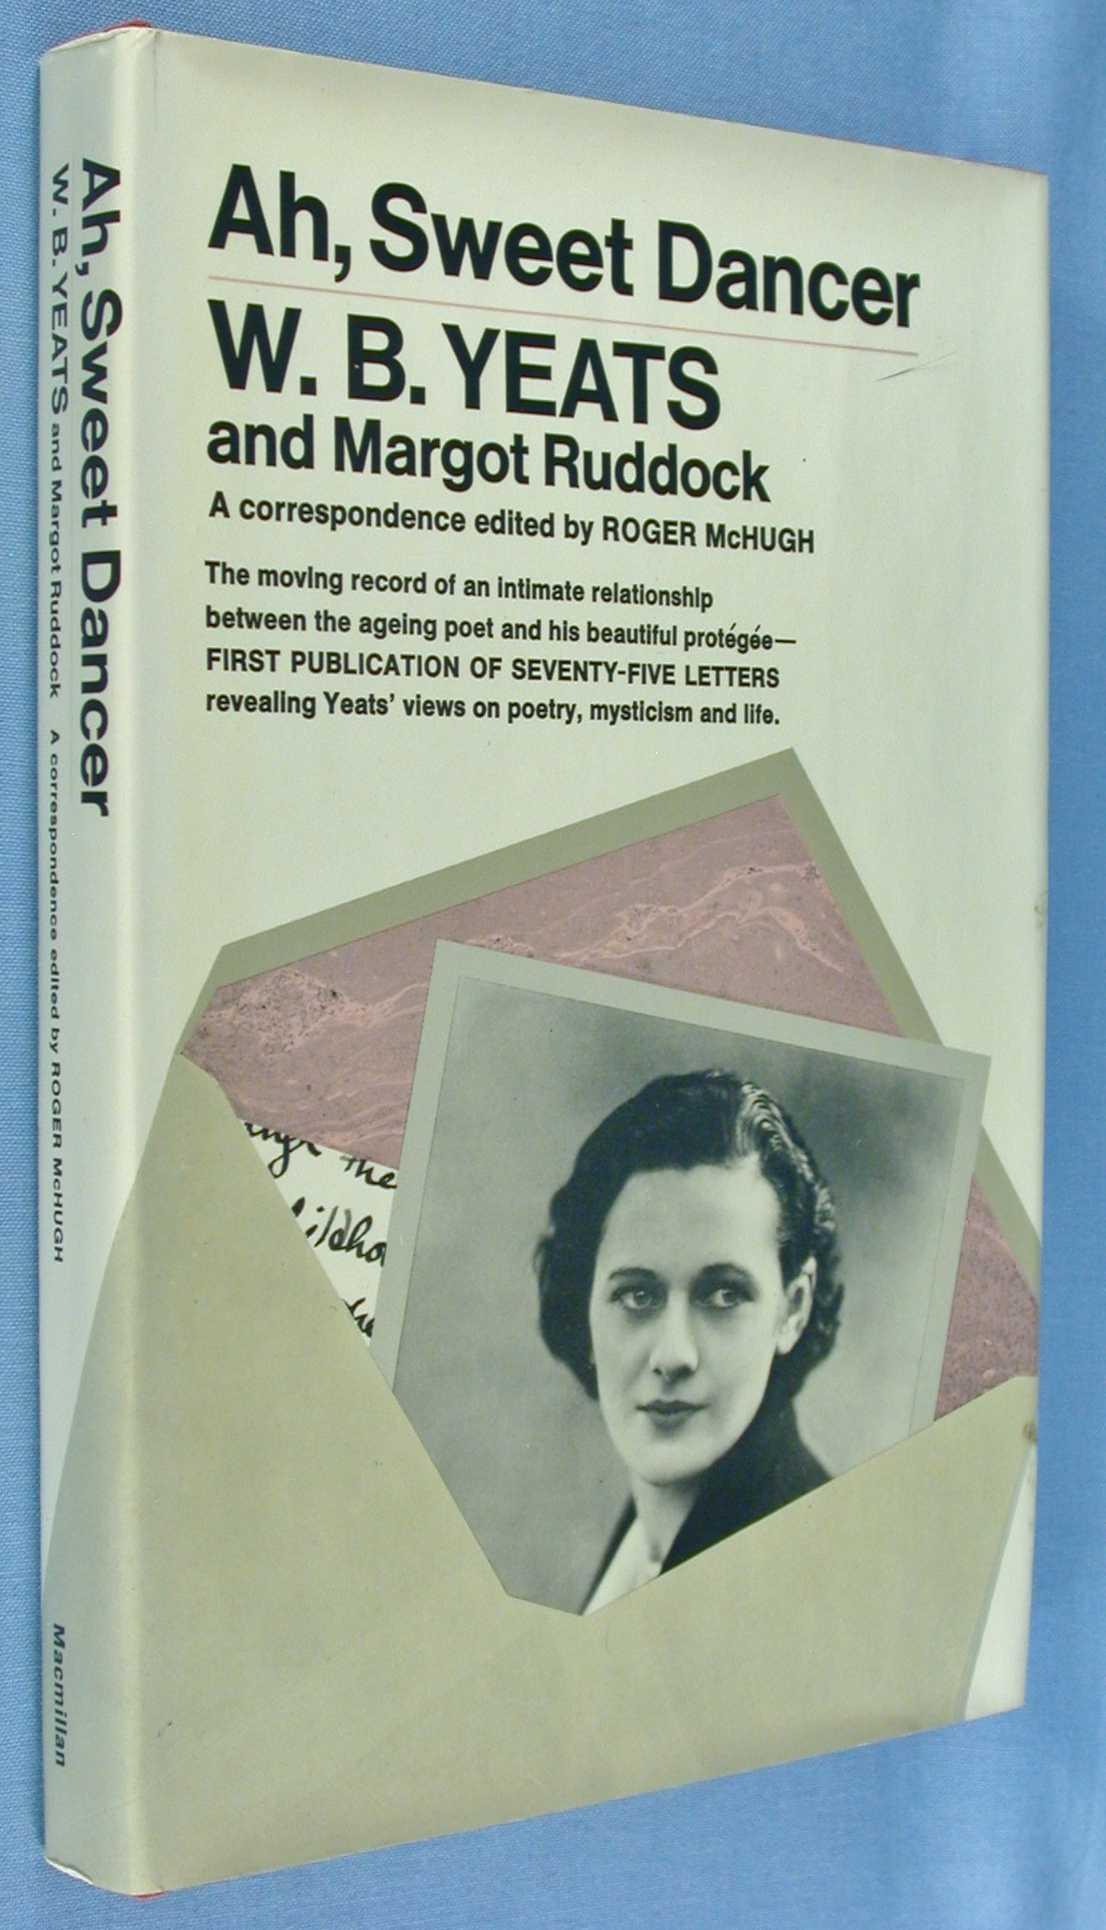 Ah, Sweet Dancer:  W.B. Yeats and Margot Ruddock, McHugh, Roger (editor)